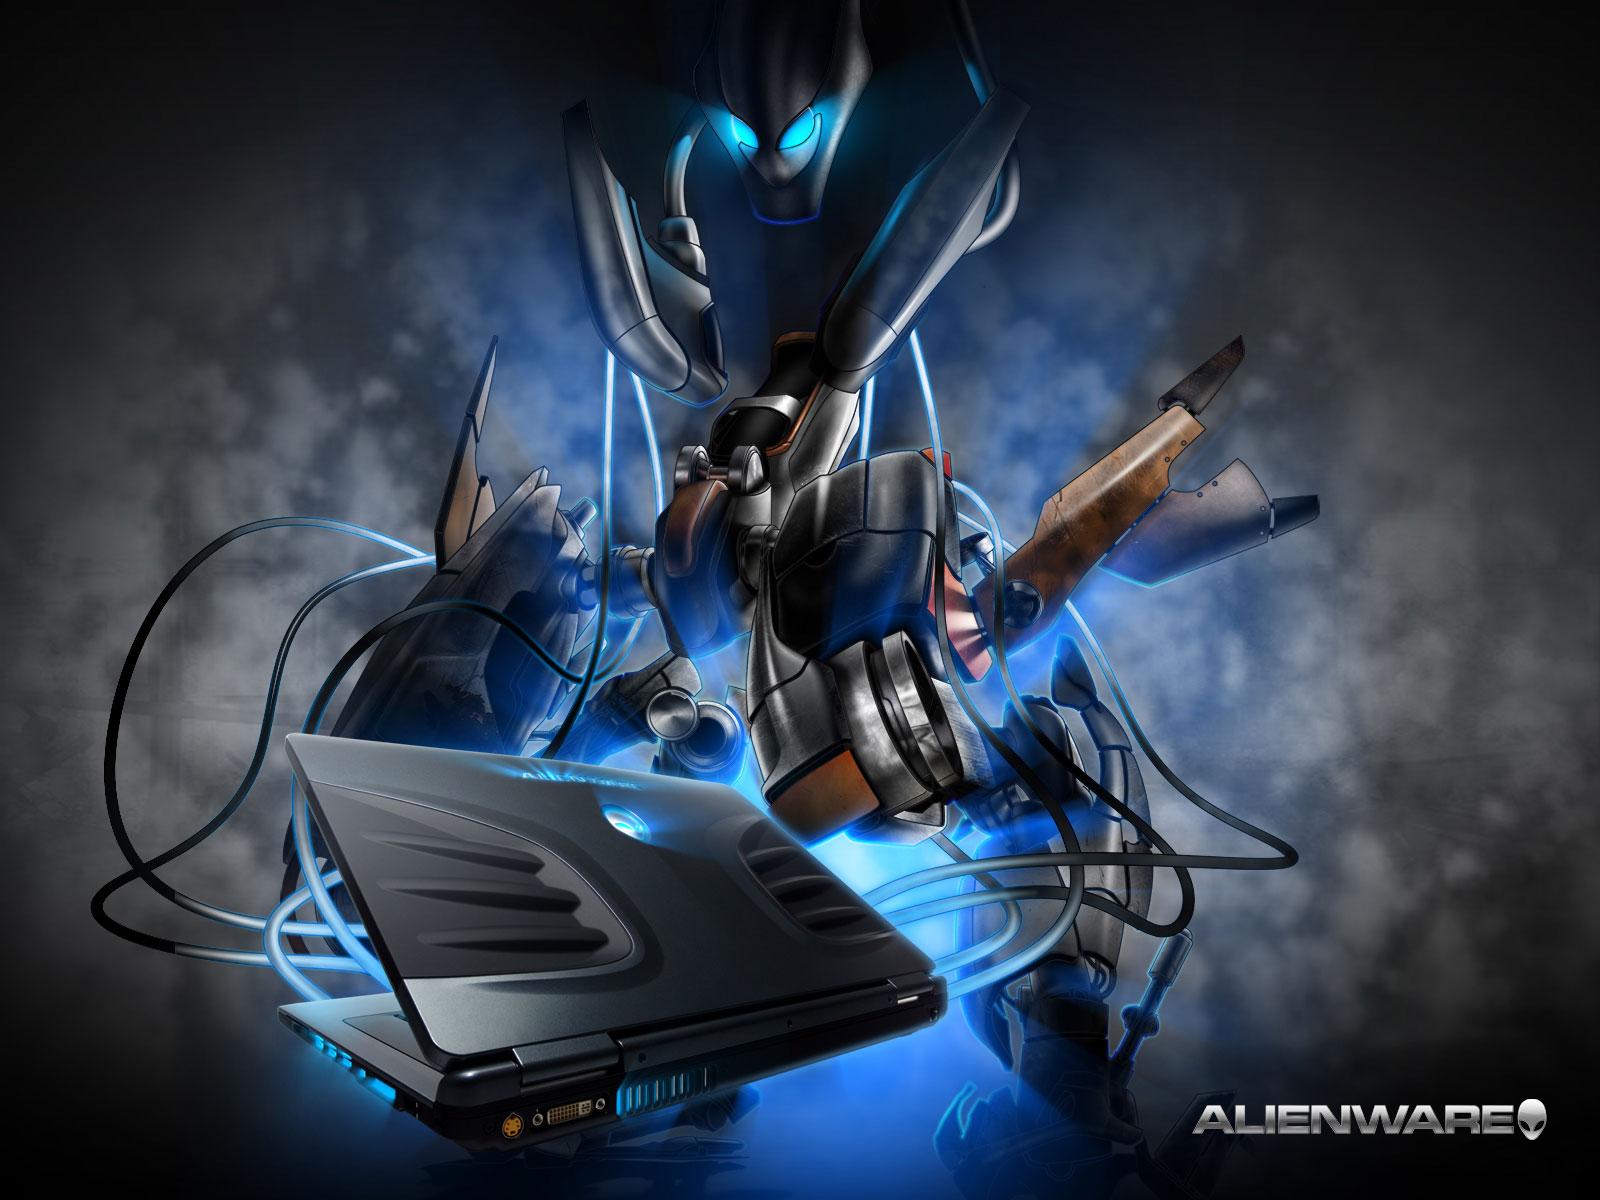 http://3.bp.blogspot.com/-8ID2cMp8opo/TmTCrOQJfgI/AAAAAAAAAf8/BwqZAljd2jw/s1600/Alienware-Wallpapers-.jpg